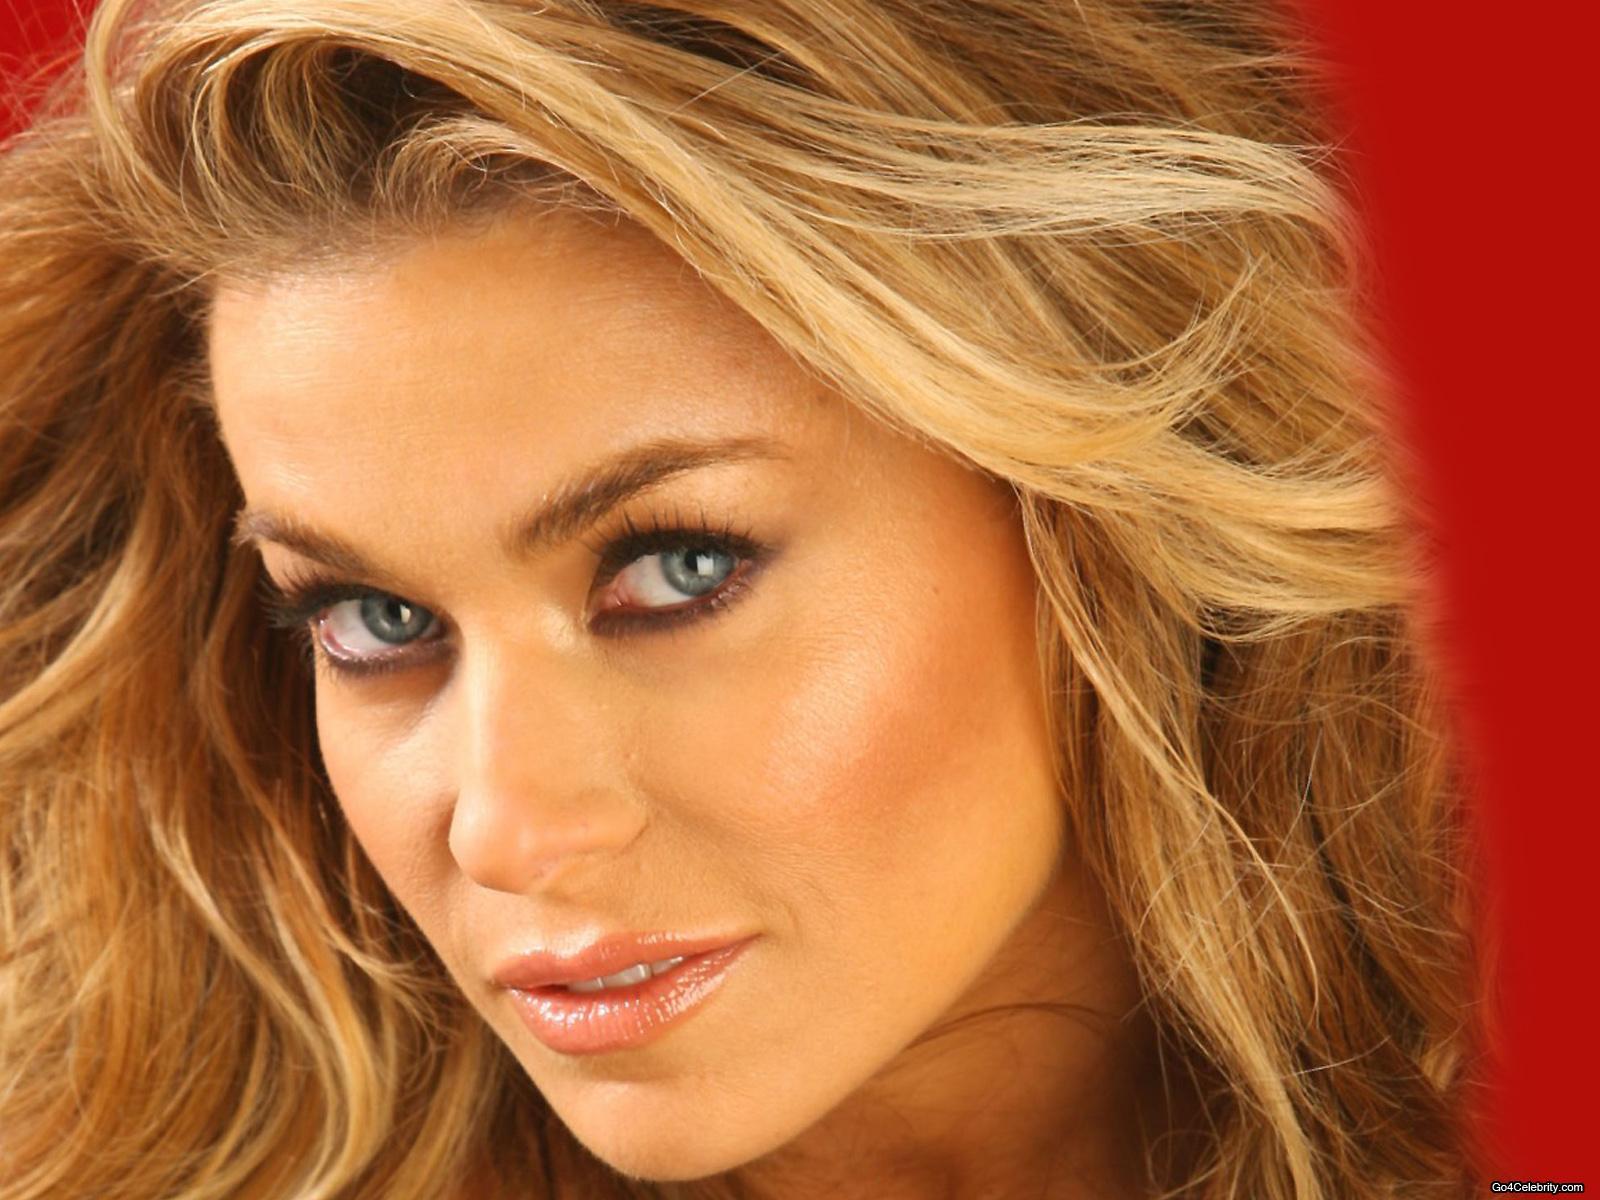 http://4.bp.blogspot.com/-ngLhwjkxG04/TyjoxLrEWvI/AAAAAAAABME/Shu57yGhSxg/s1600/pictures-of-Carmen-Electra-actress-model-singer-dancer+9.jpg